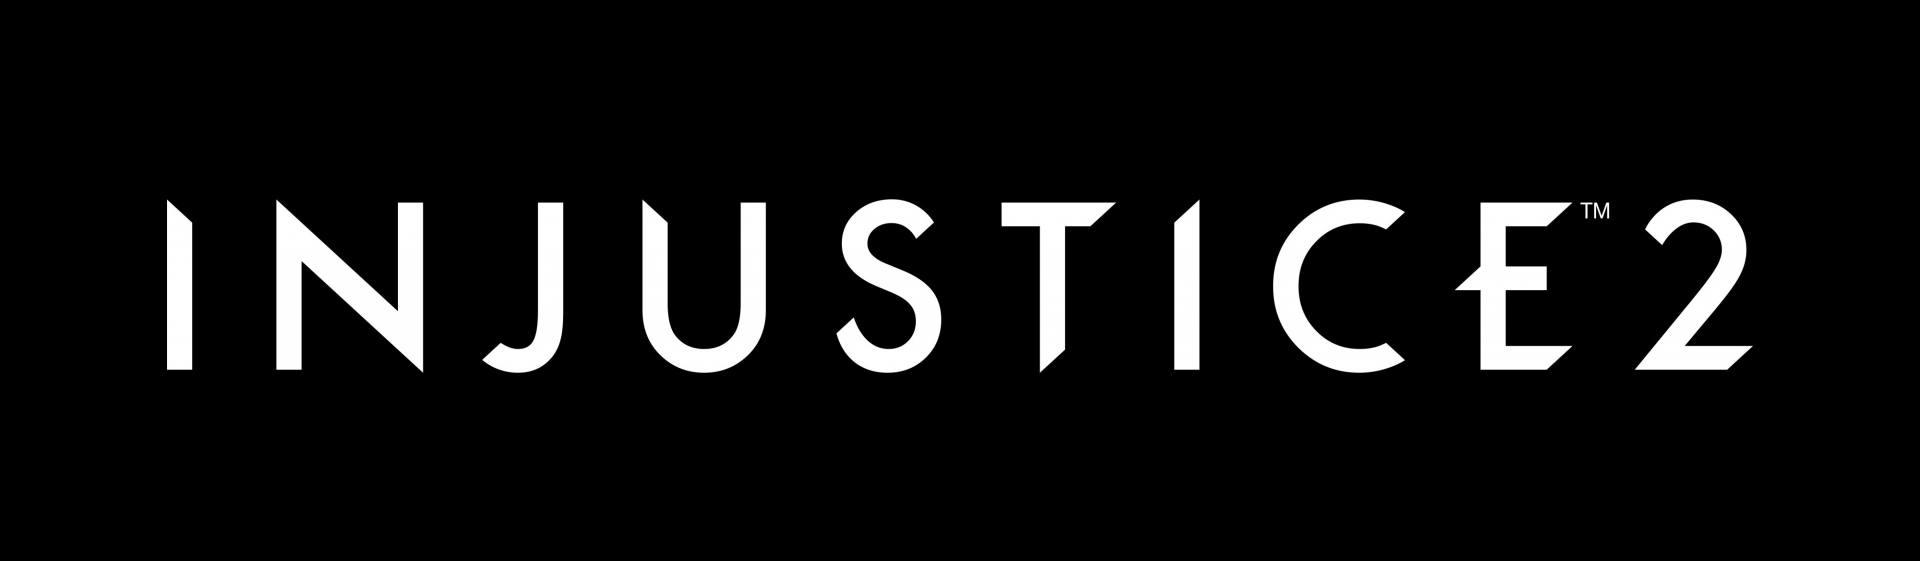 Injustice-2_2016_06-08-16_002